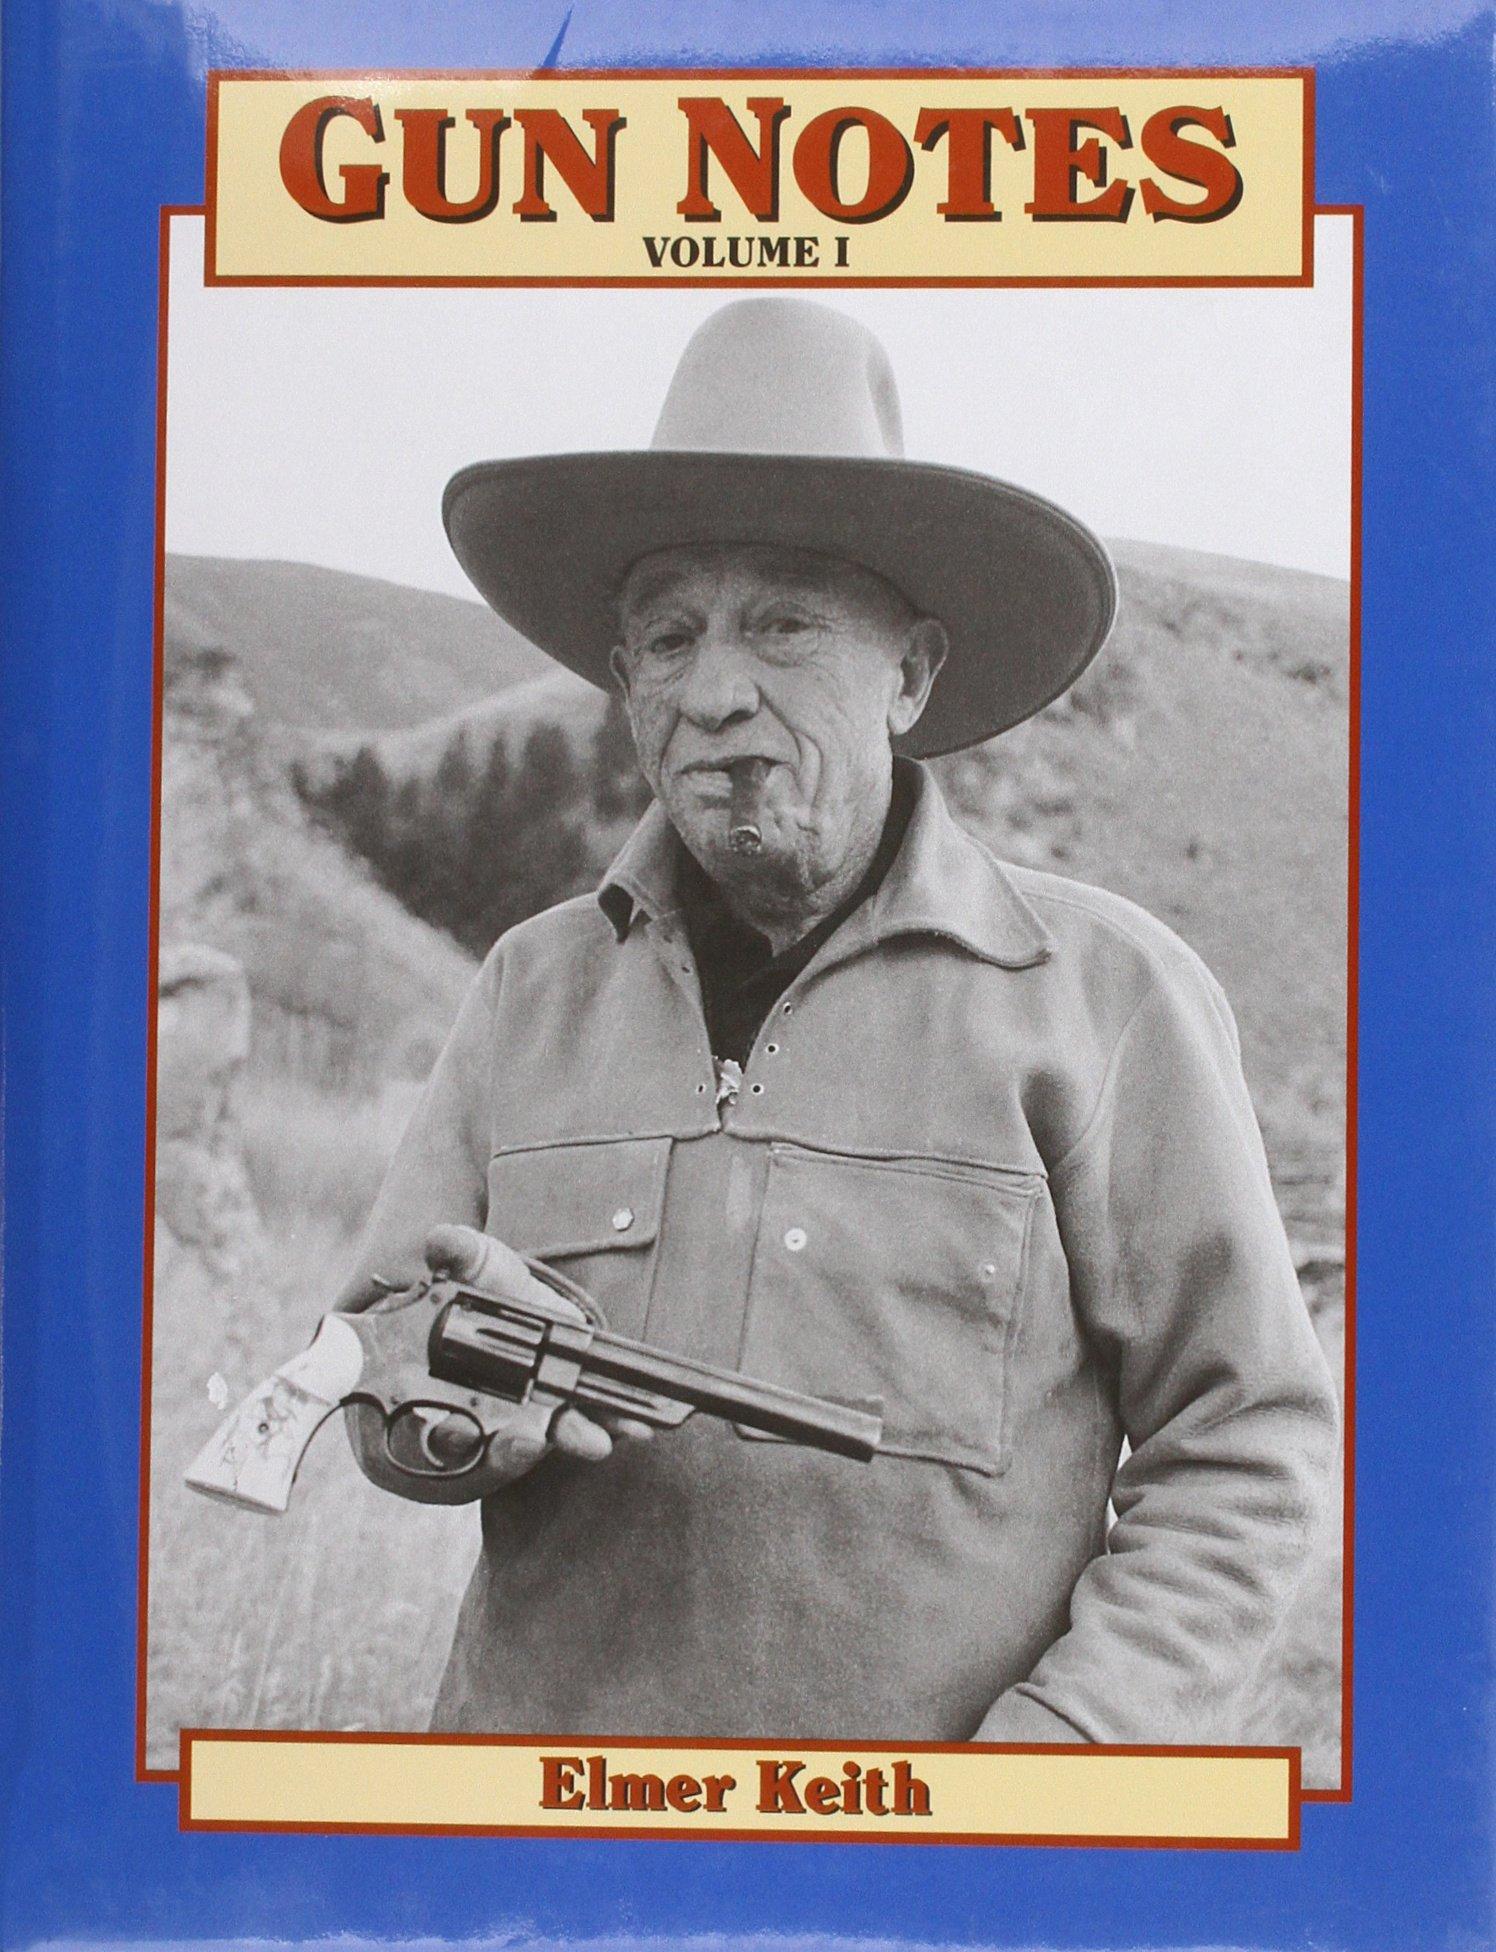 Gun Notes, Volume I: Second Edition (Gunnotes Vol. 1)